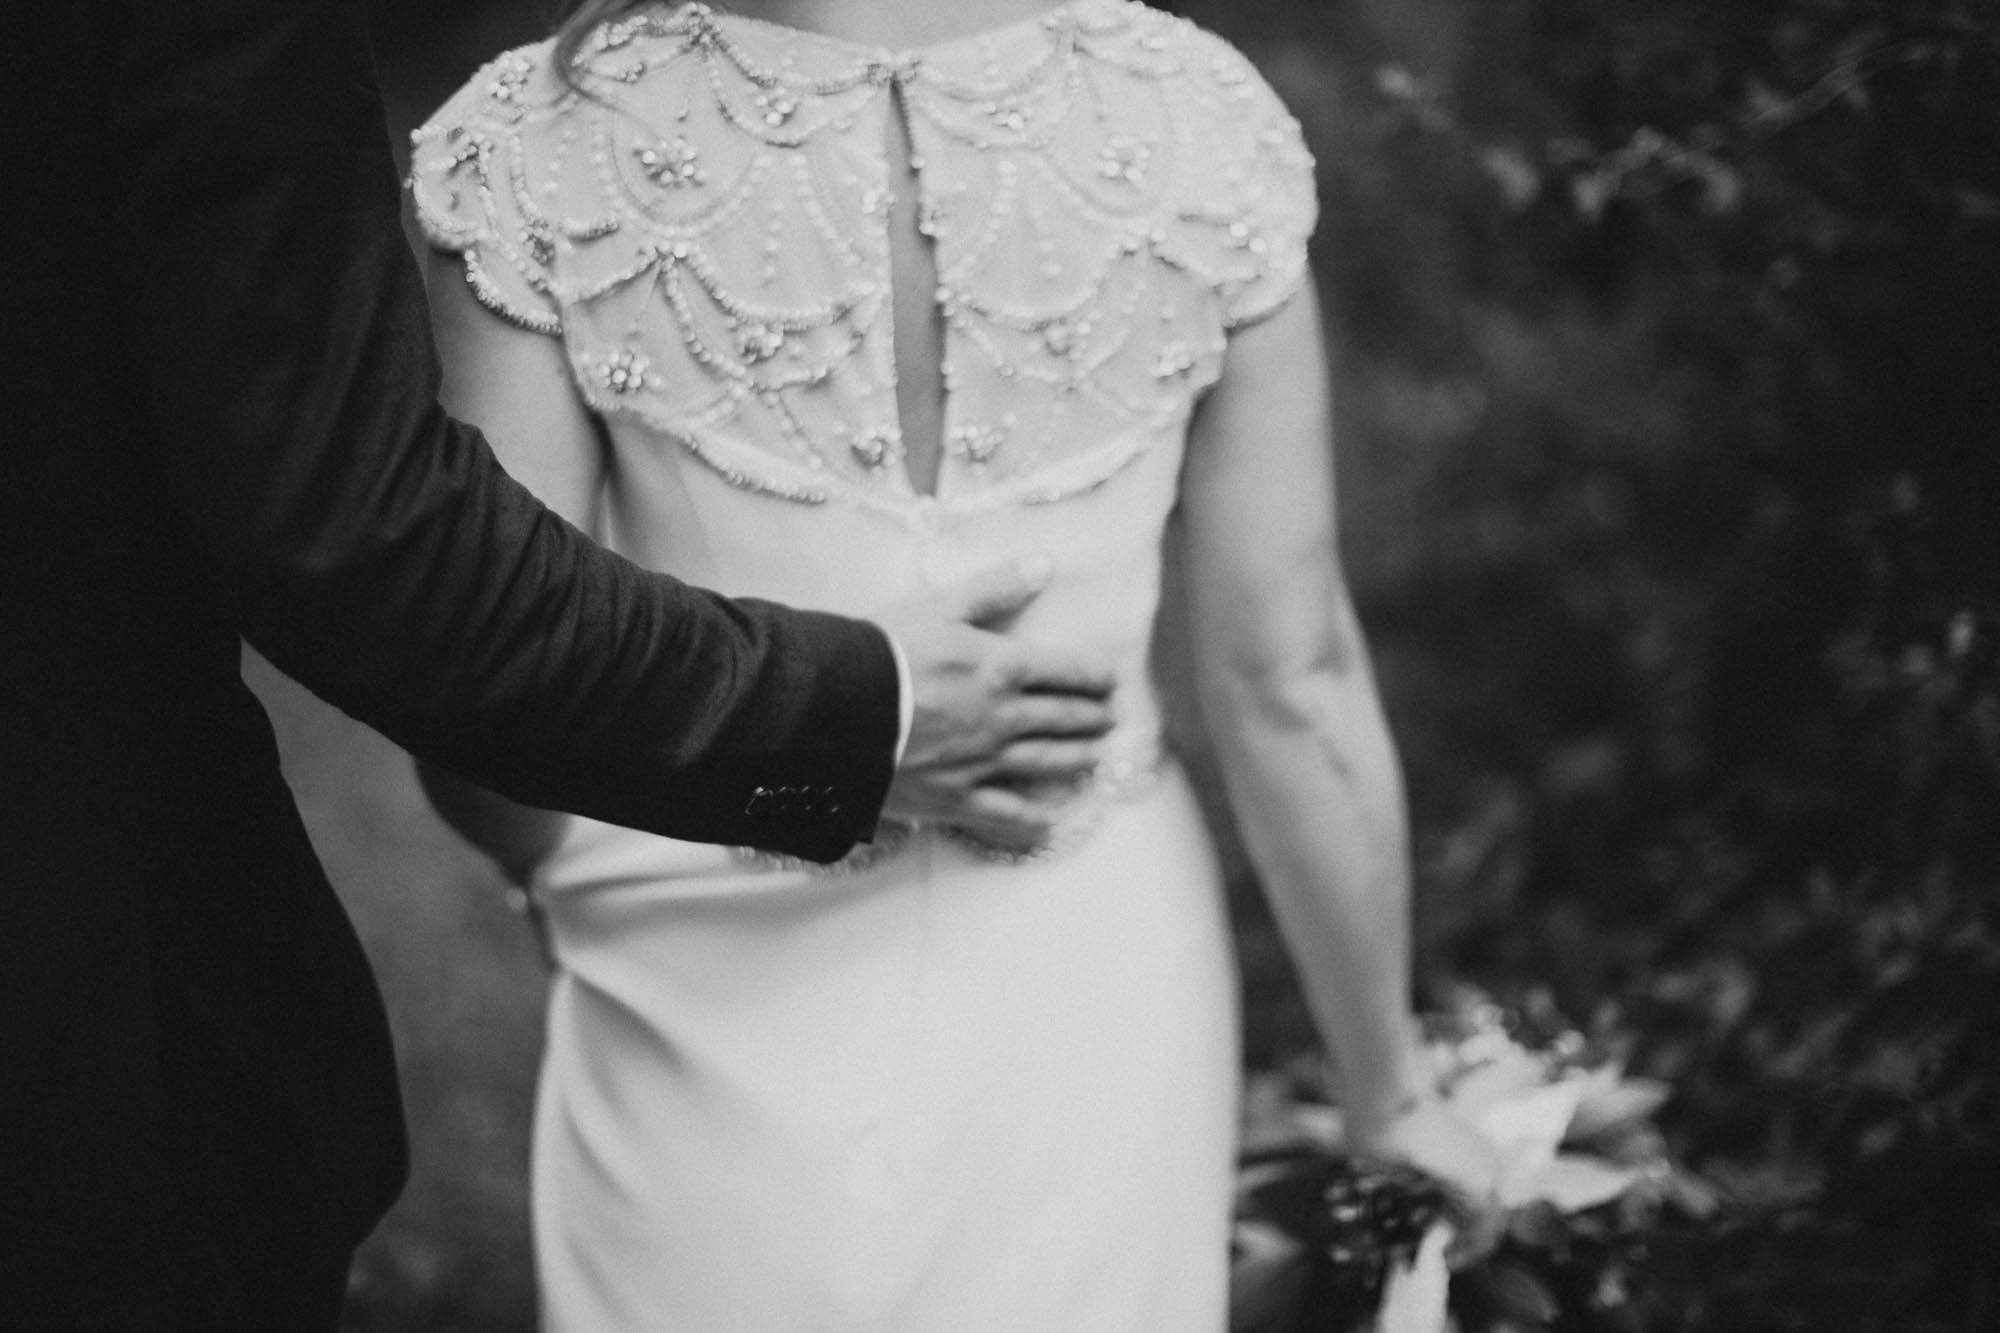 Leah-Graham-Michigan-Outdoor-DIY-Wedding-084@2x.jpg